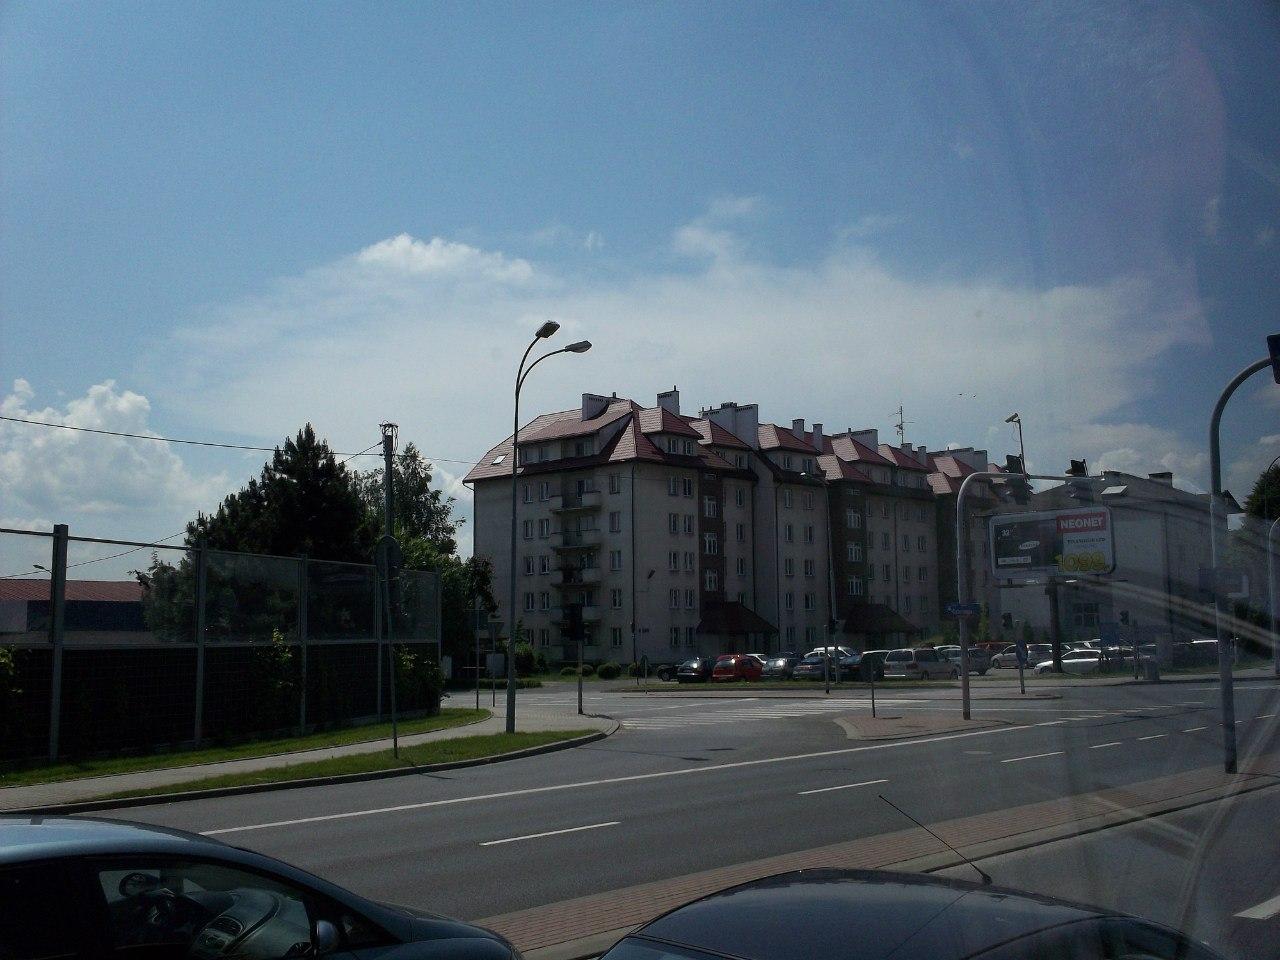 Елена Руденко. Польша. 2013 г. июнь. 4KEst6MGQYY